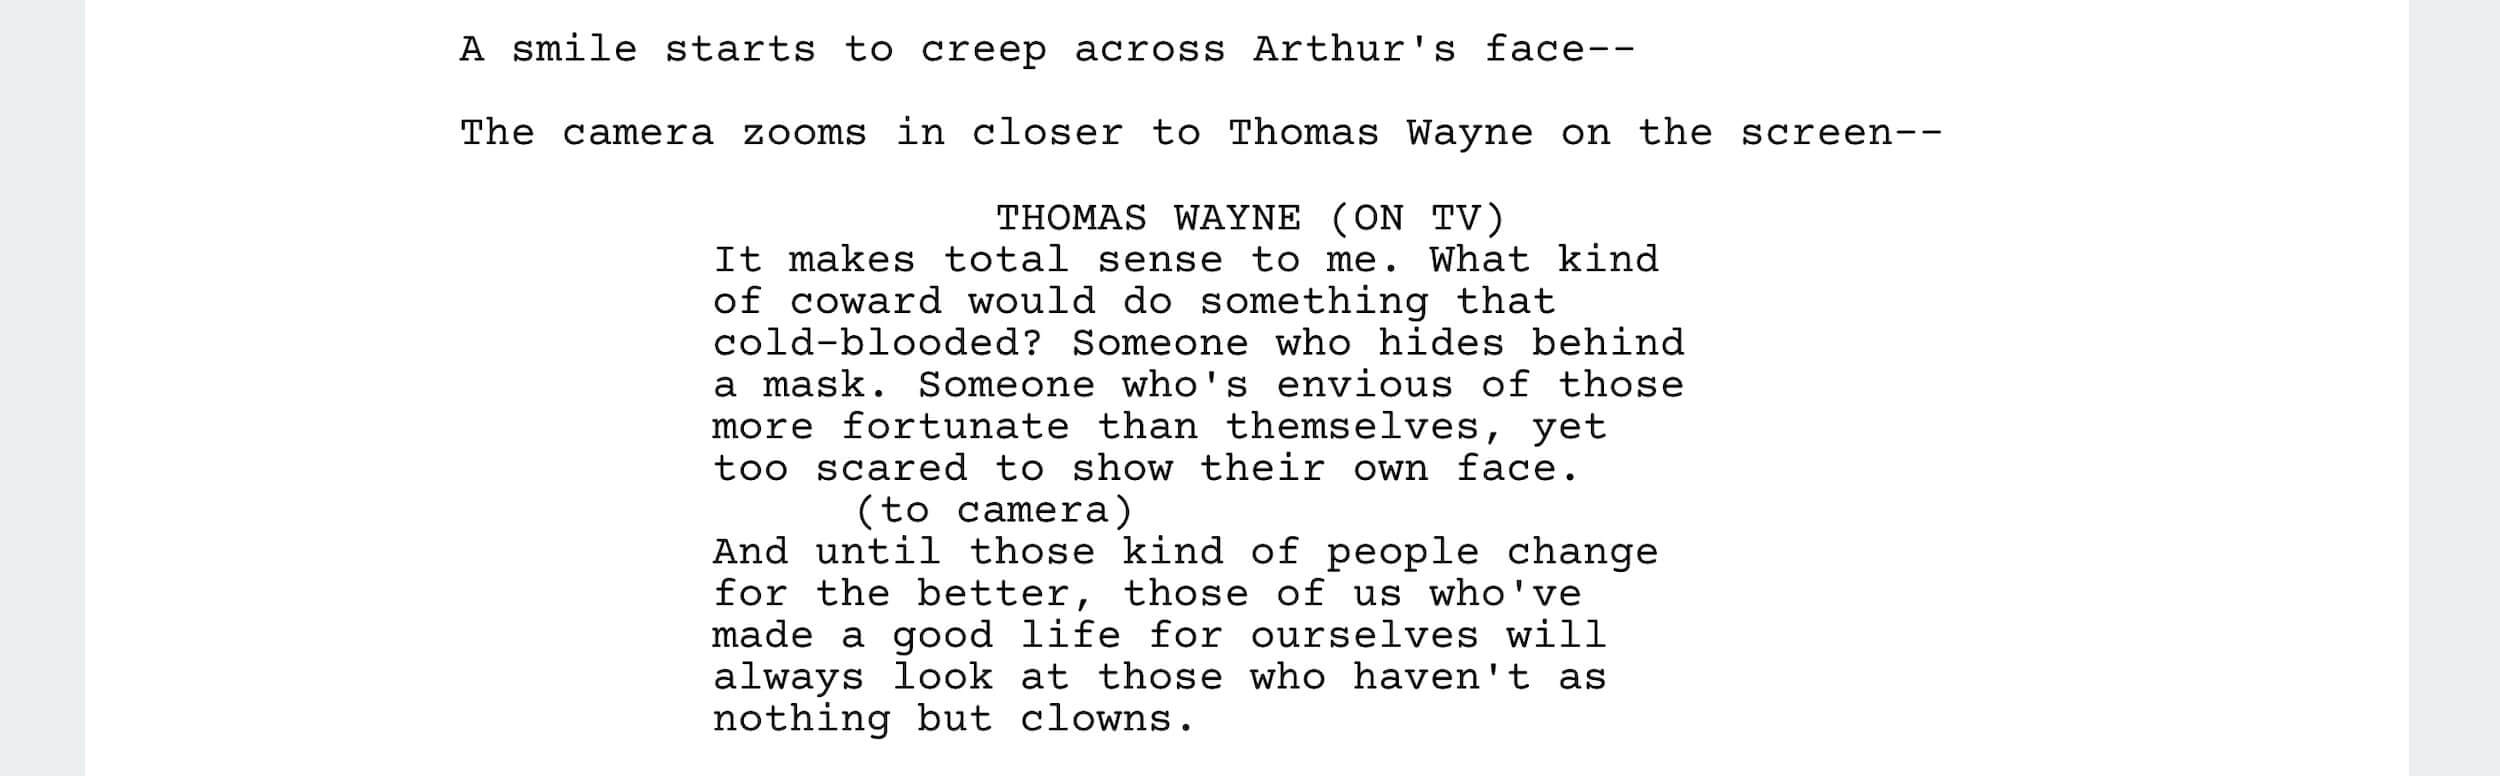 Joker Script Screenplay PDF Download - Joker Quotes - StudioBinder Screenwriting Software